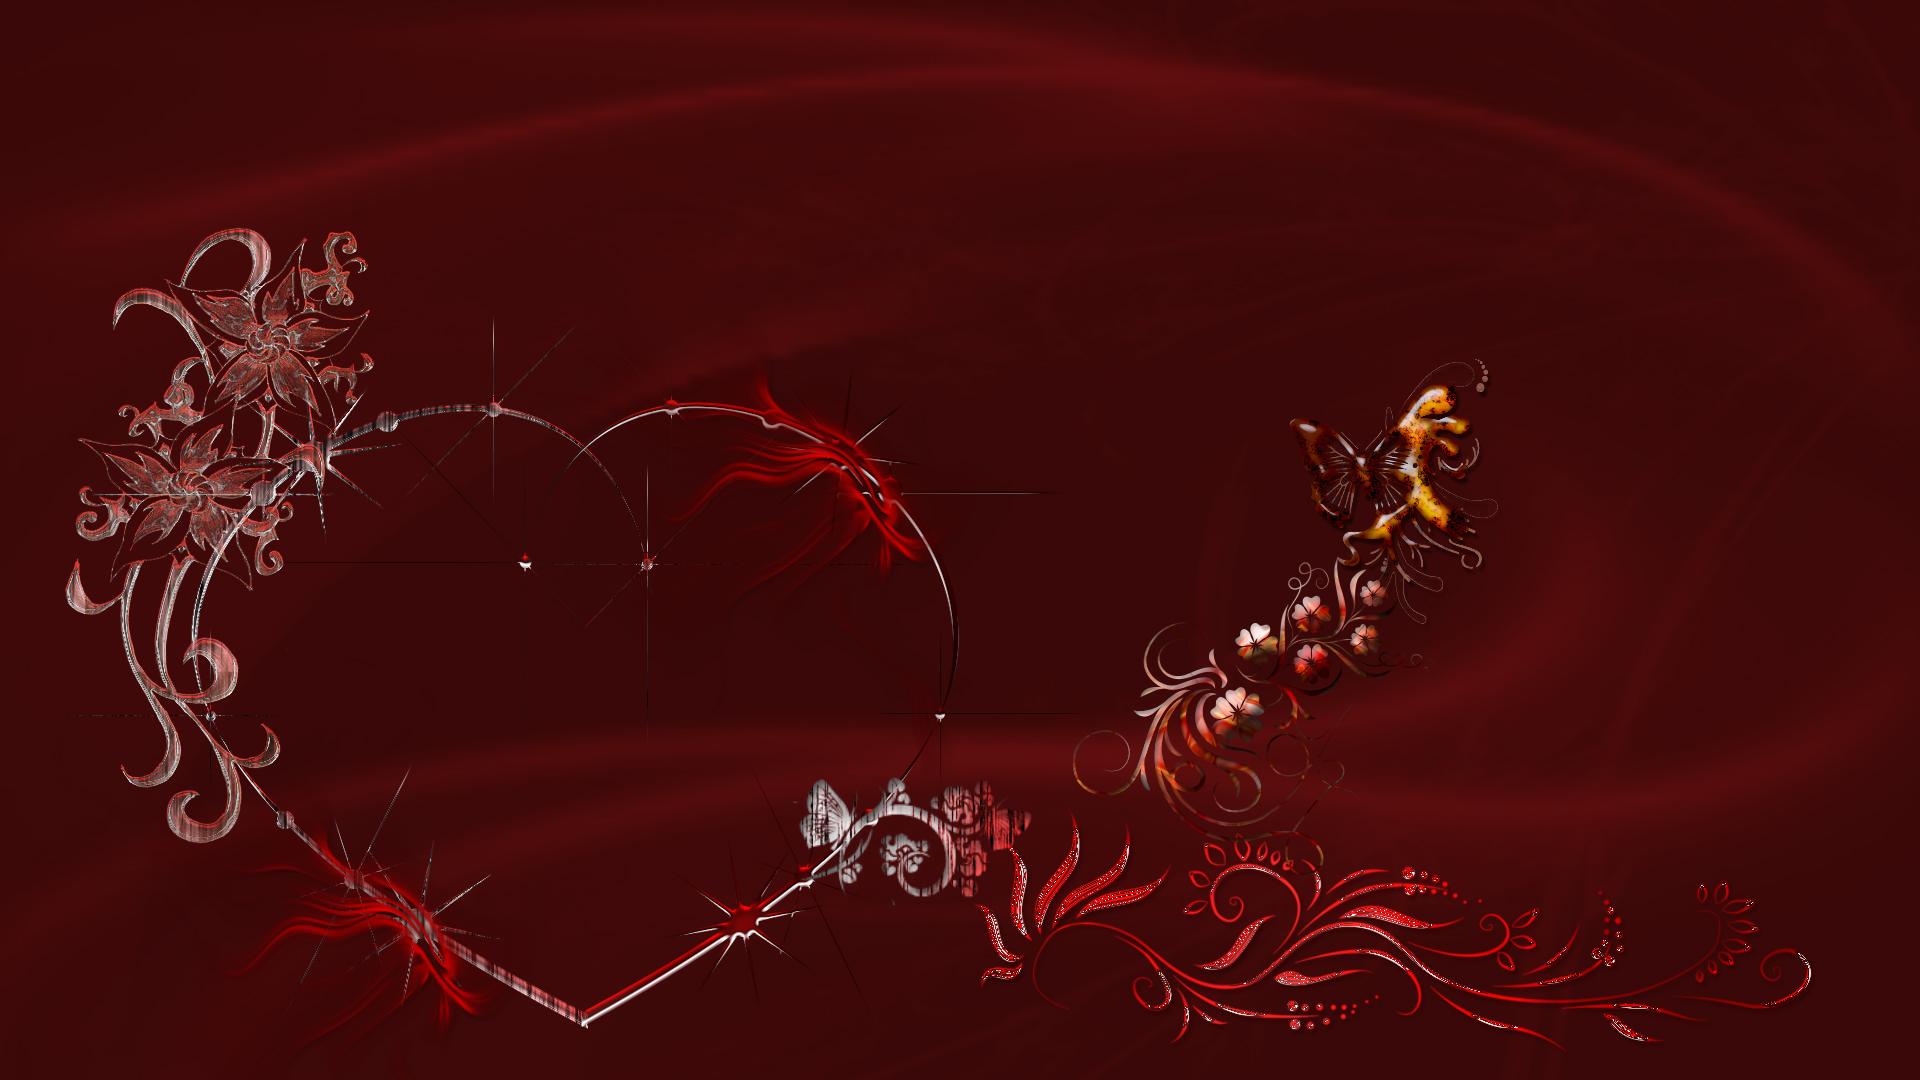 Valentine 39 s day hd wallpaper background image - San valentin desktop backgrounds ...